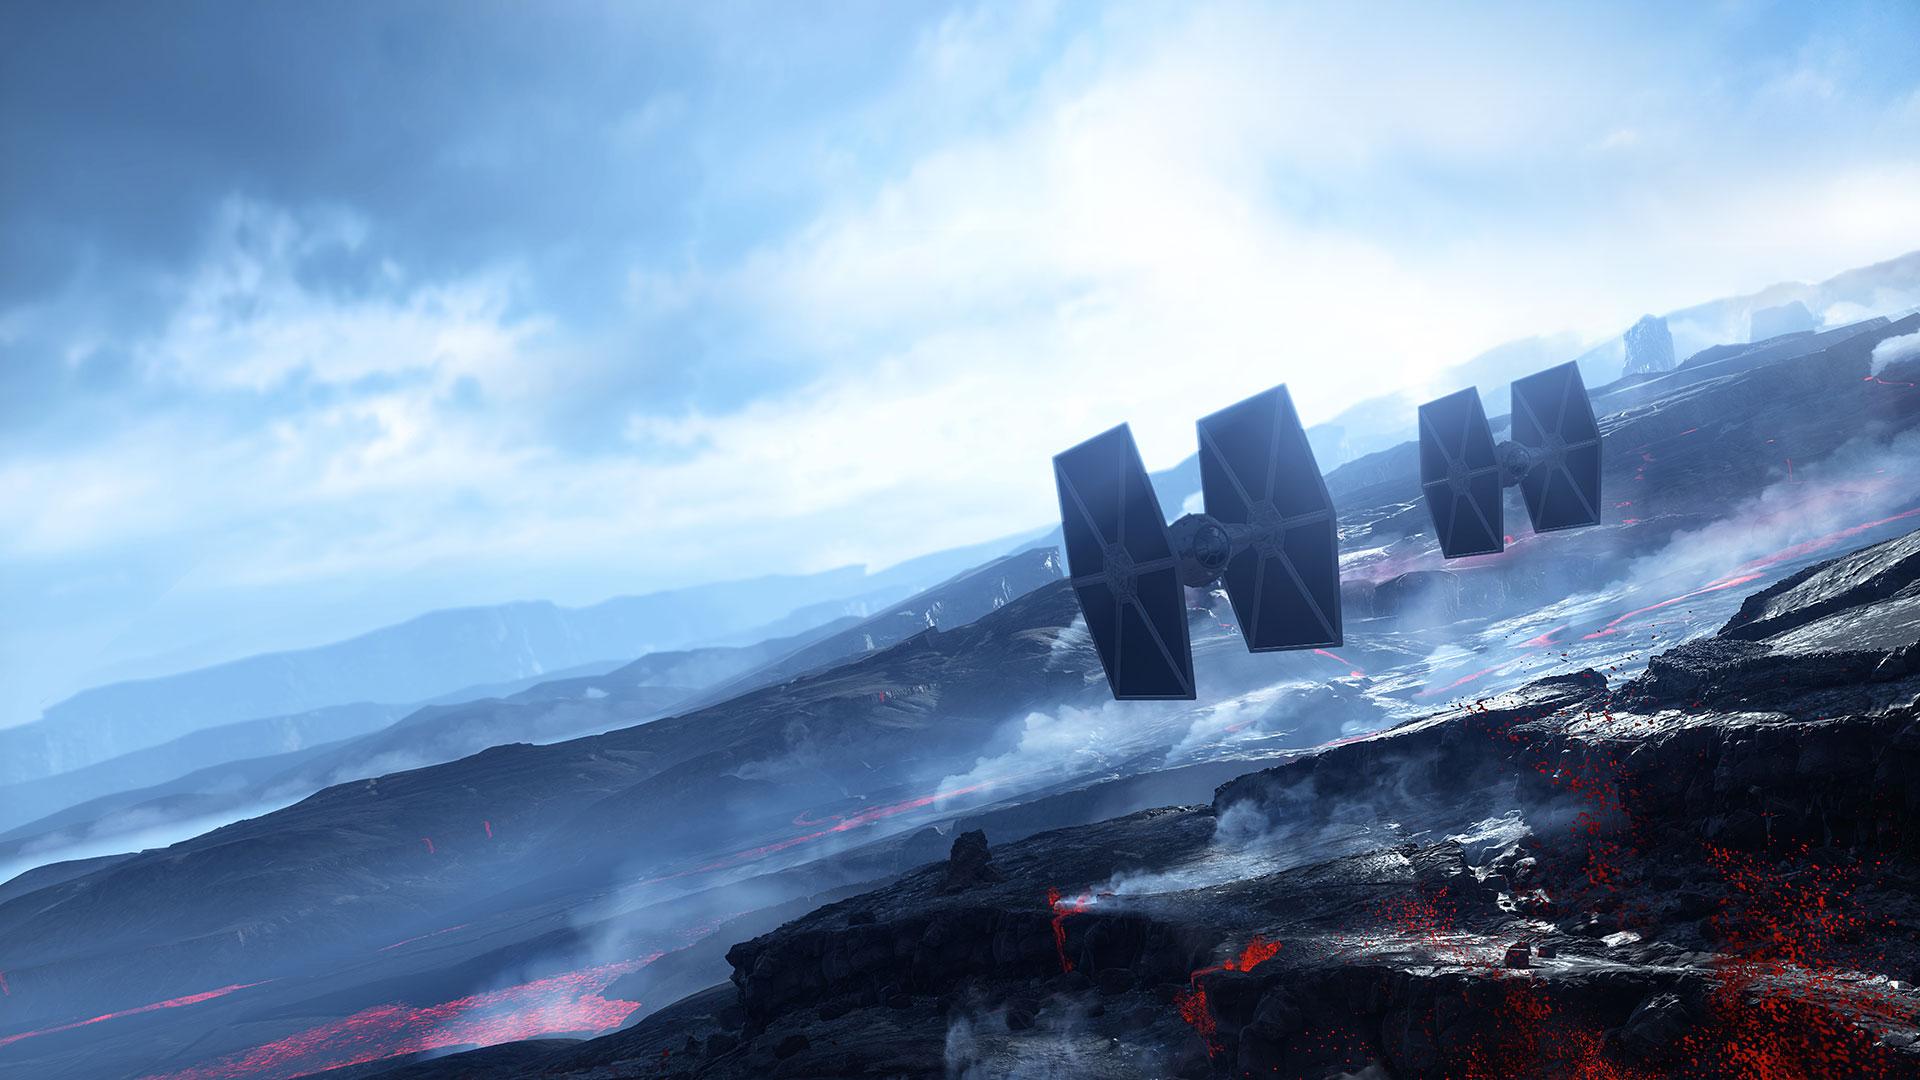 Release date for star wars battlefront in Melbourne